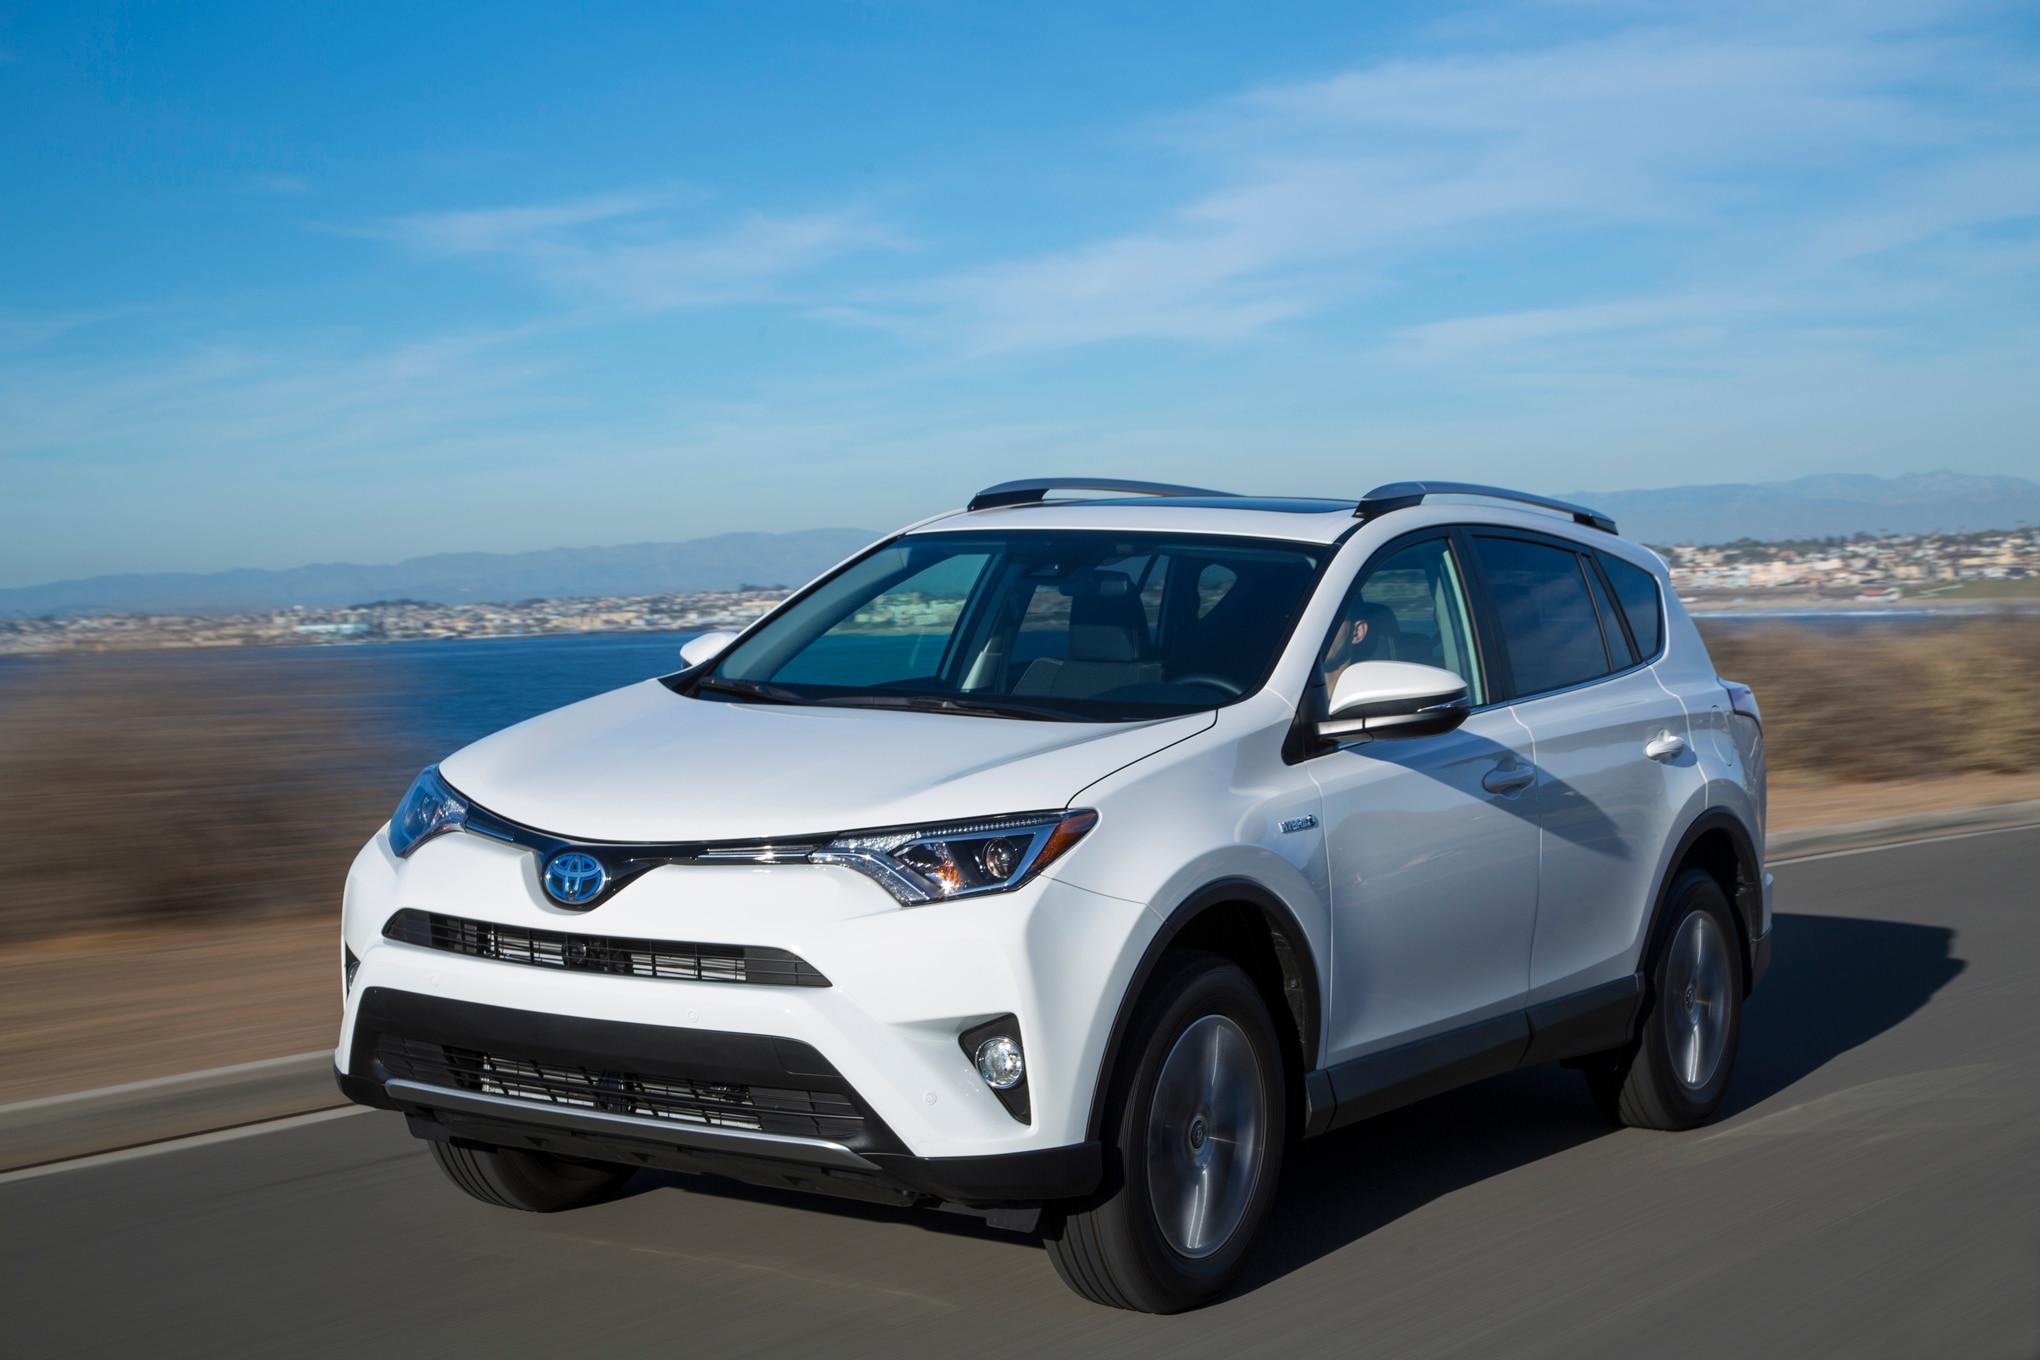 2016 Toyota RAV4 Hybrid front three quarter in motion 26